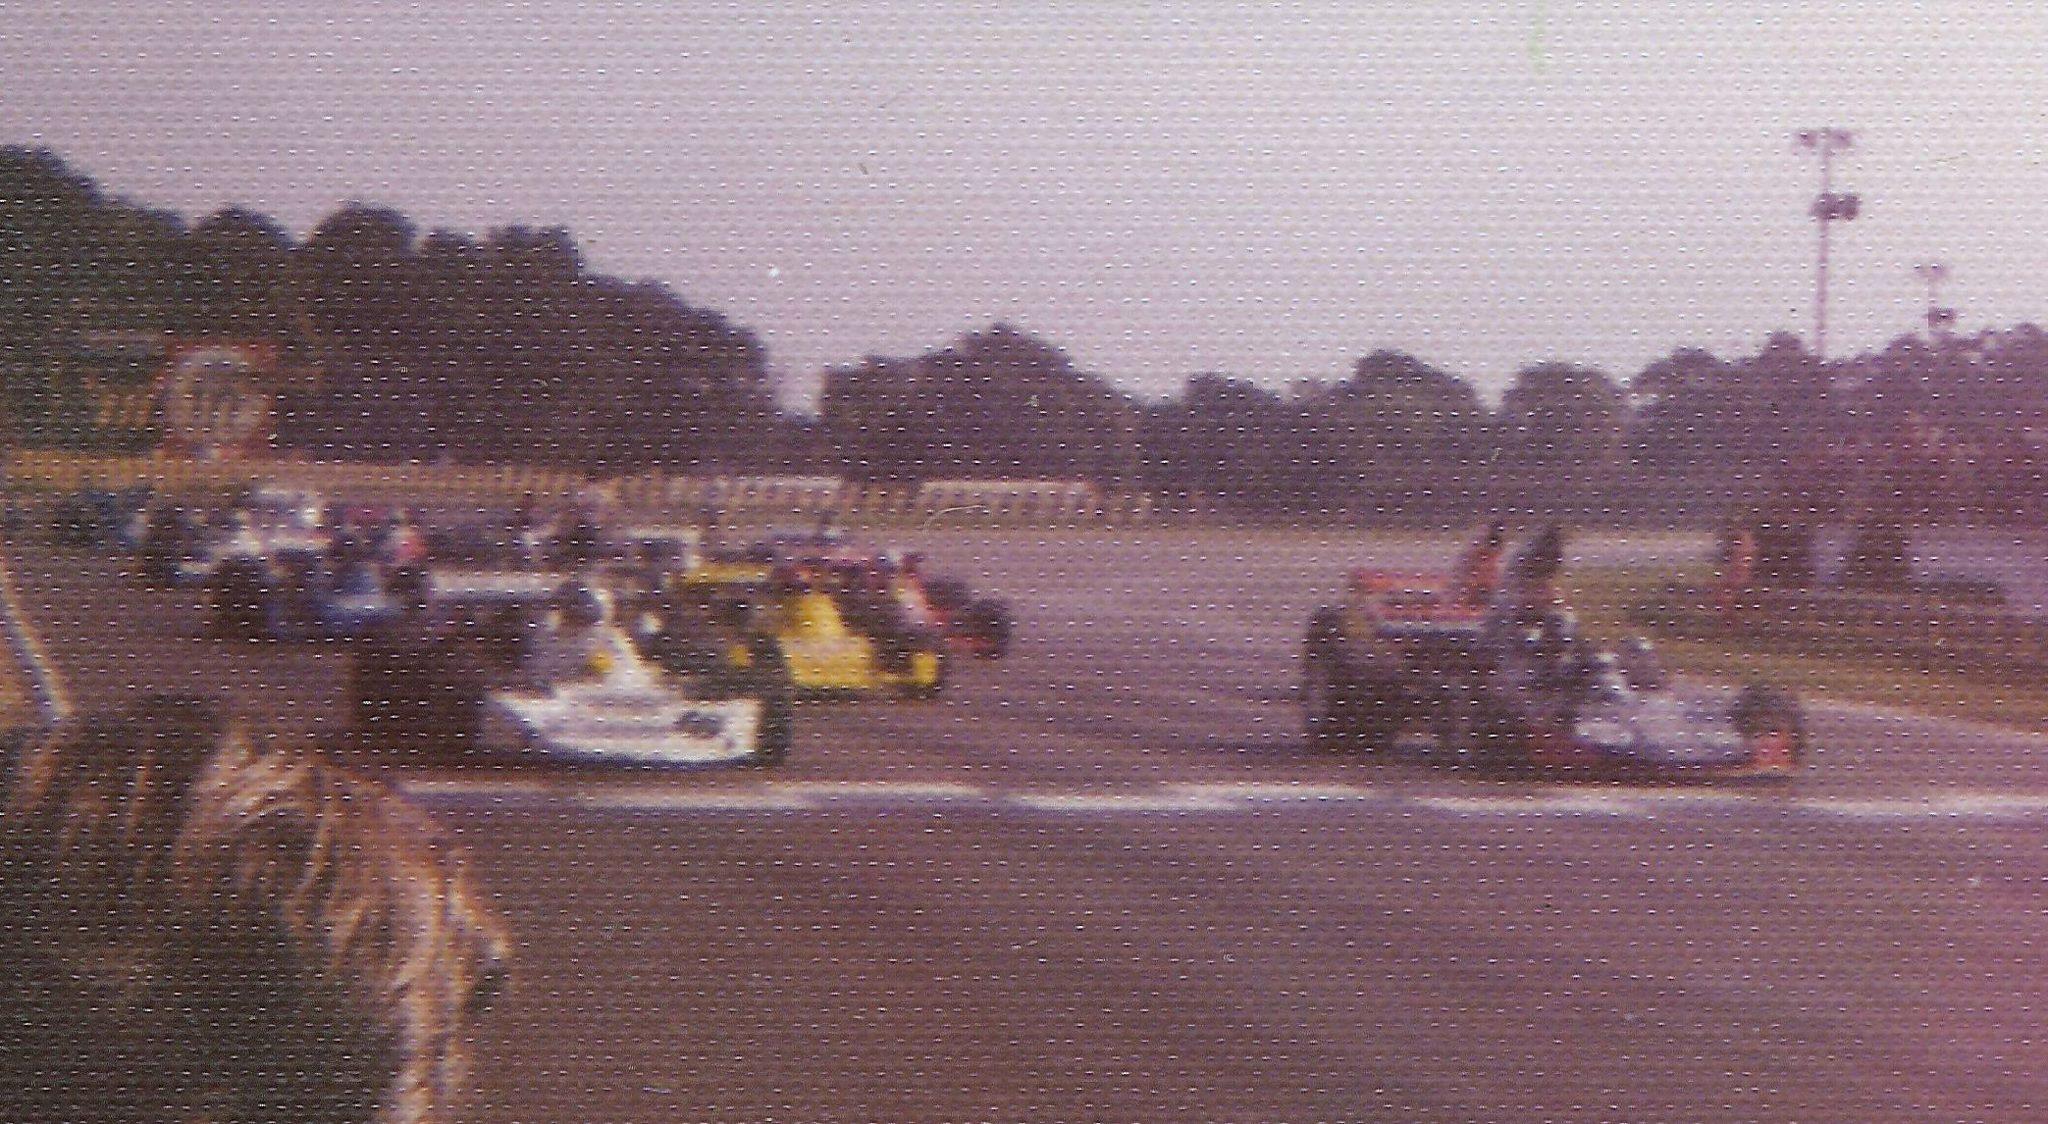 La F1 Mecánica Argentina, año 1976